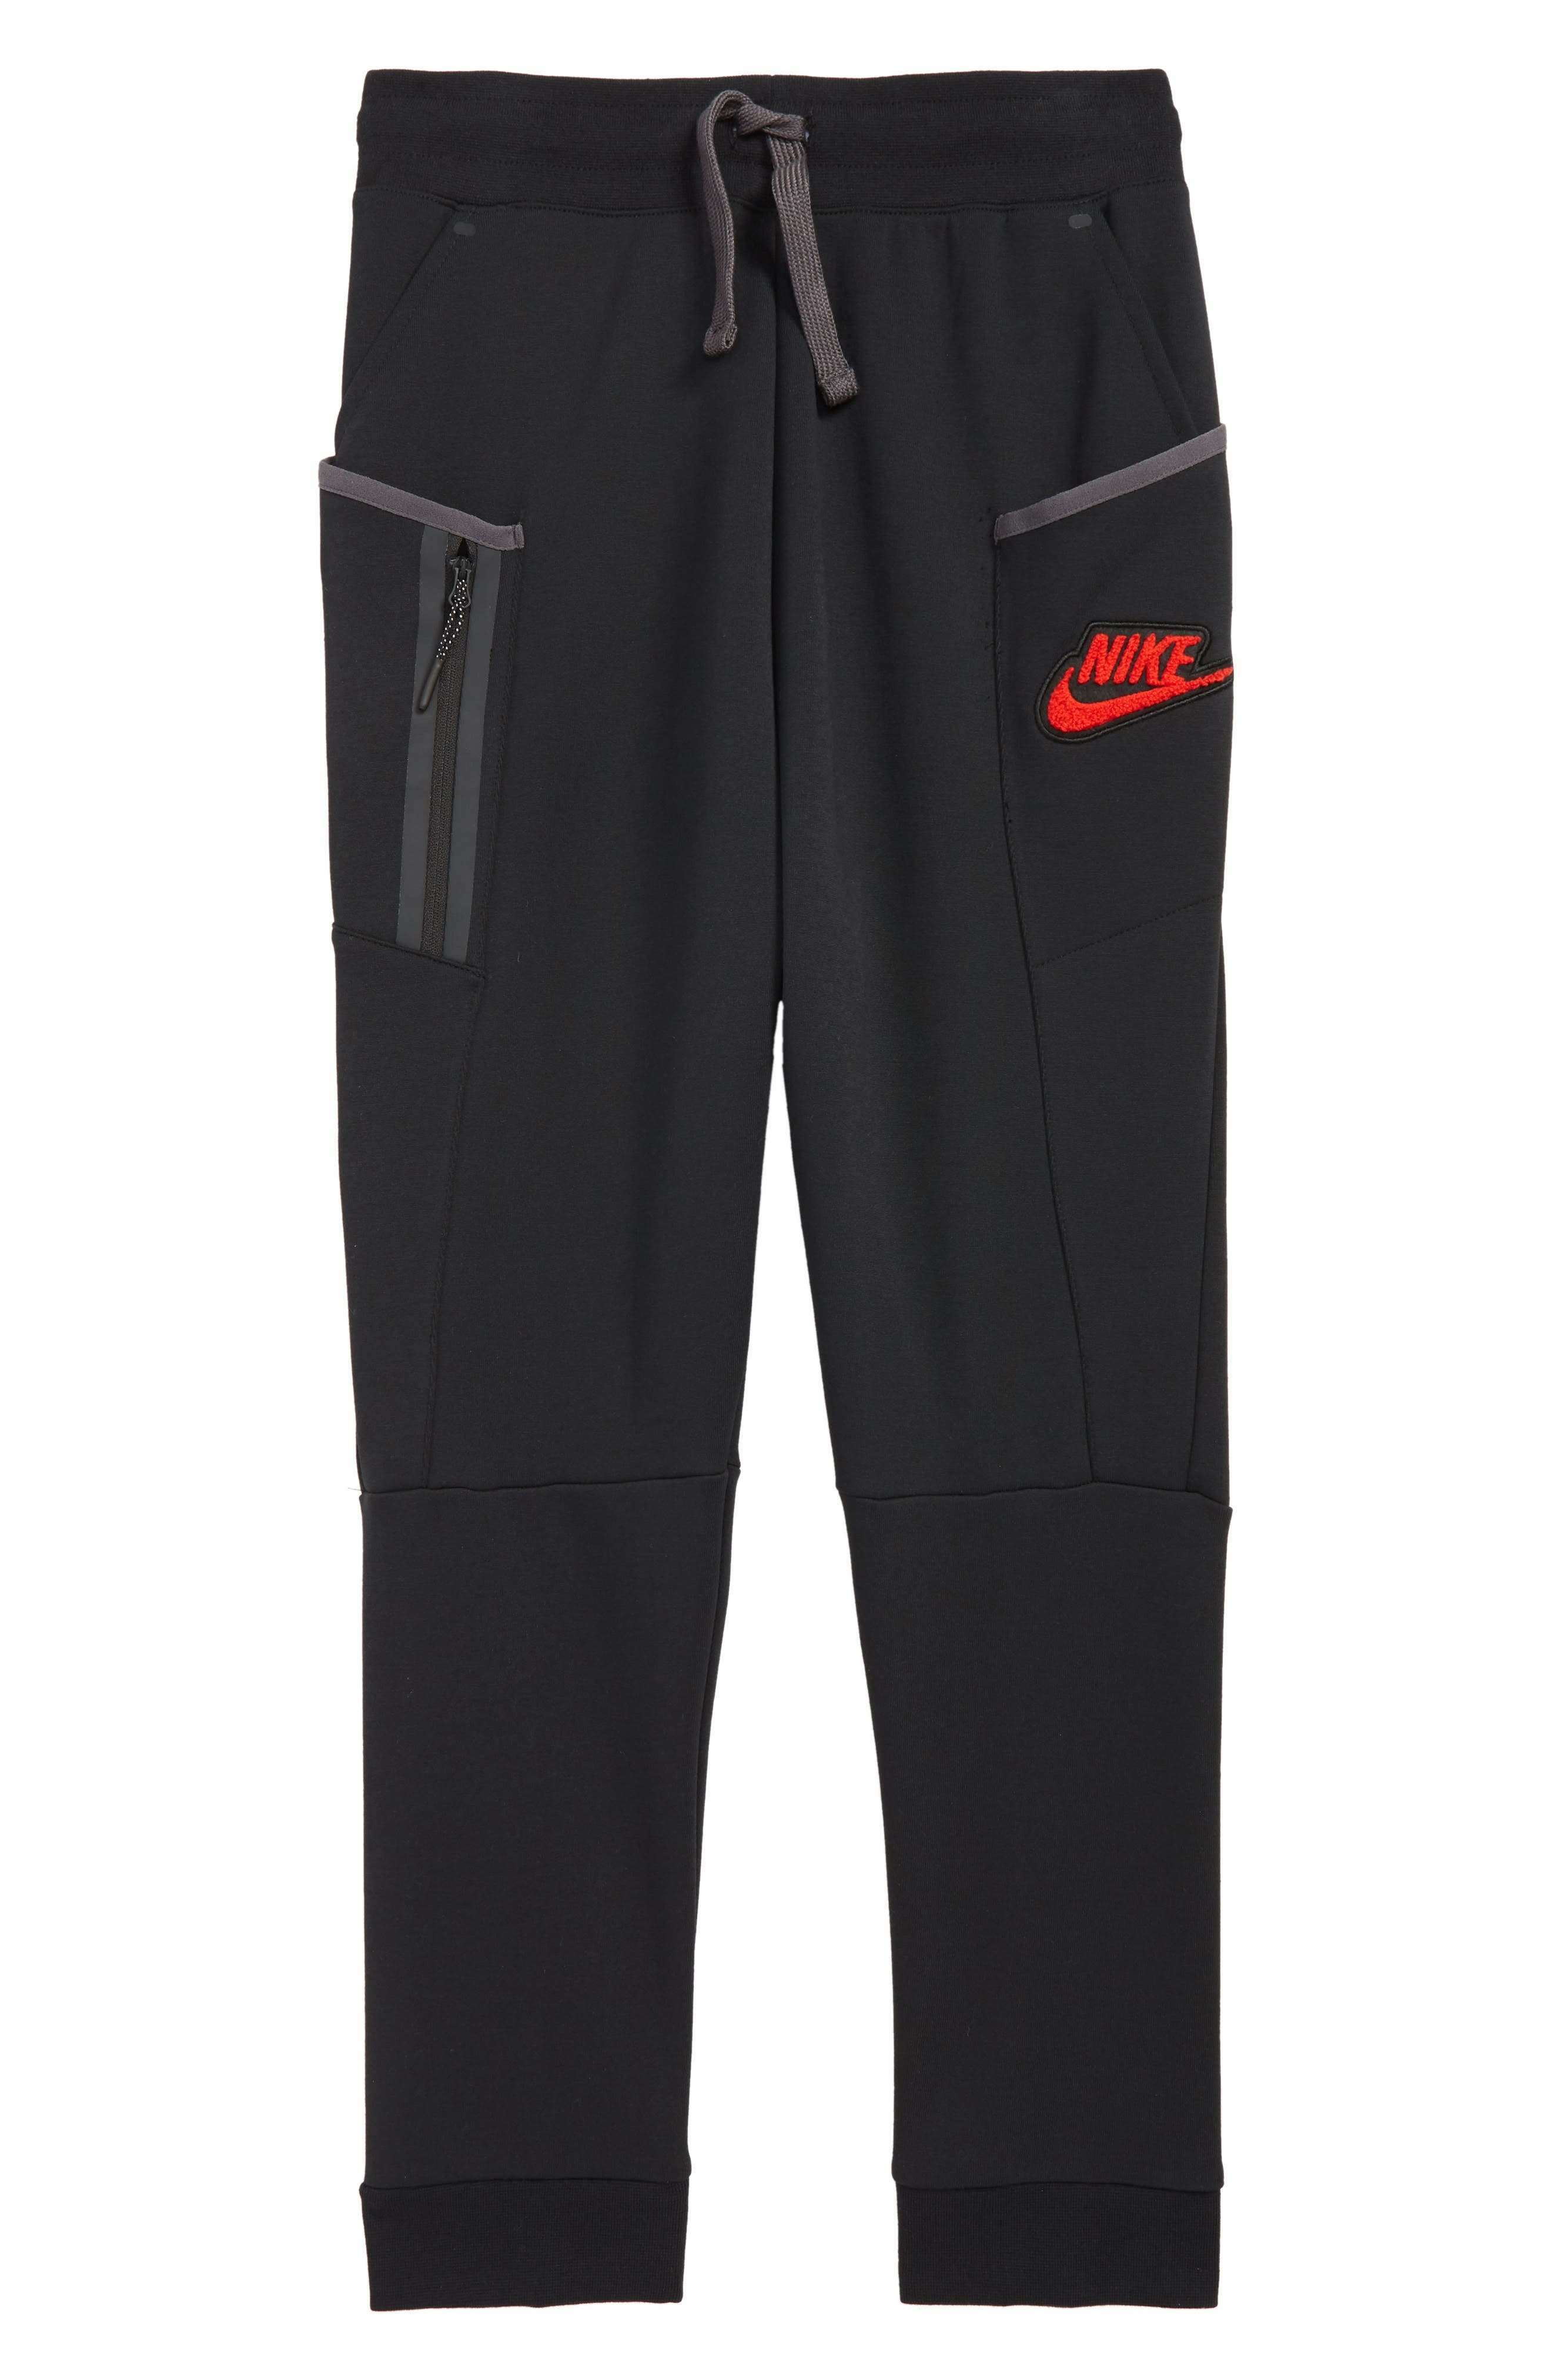 Sportswear Tech Fleece Pants,                             Main thumbnail 1, color,                             BLACK/ THUNDER GREY